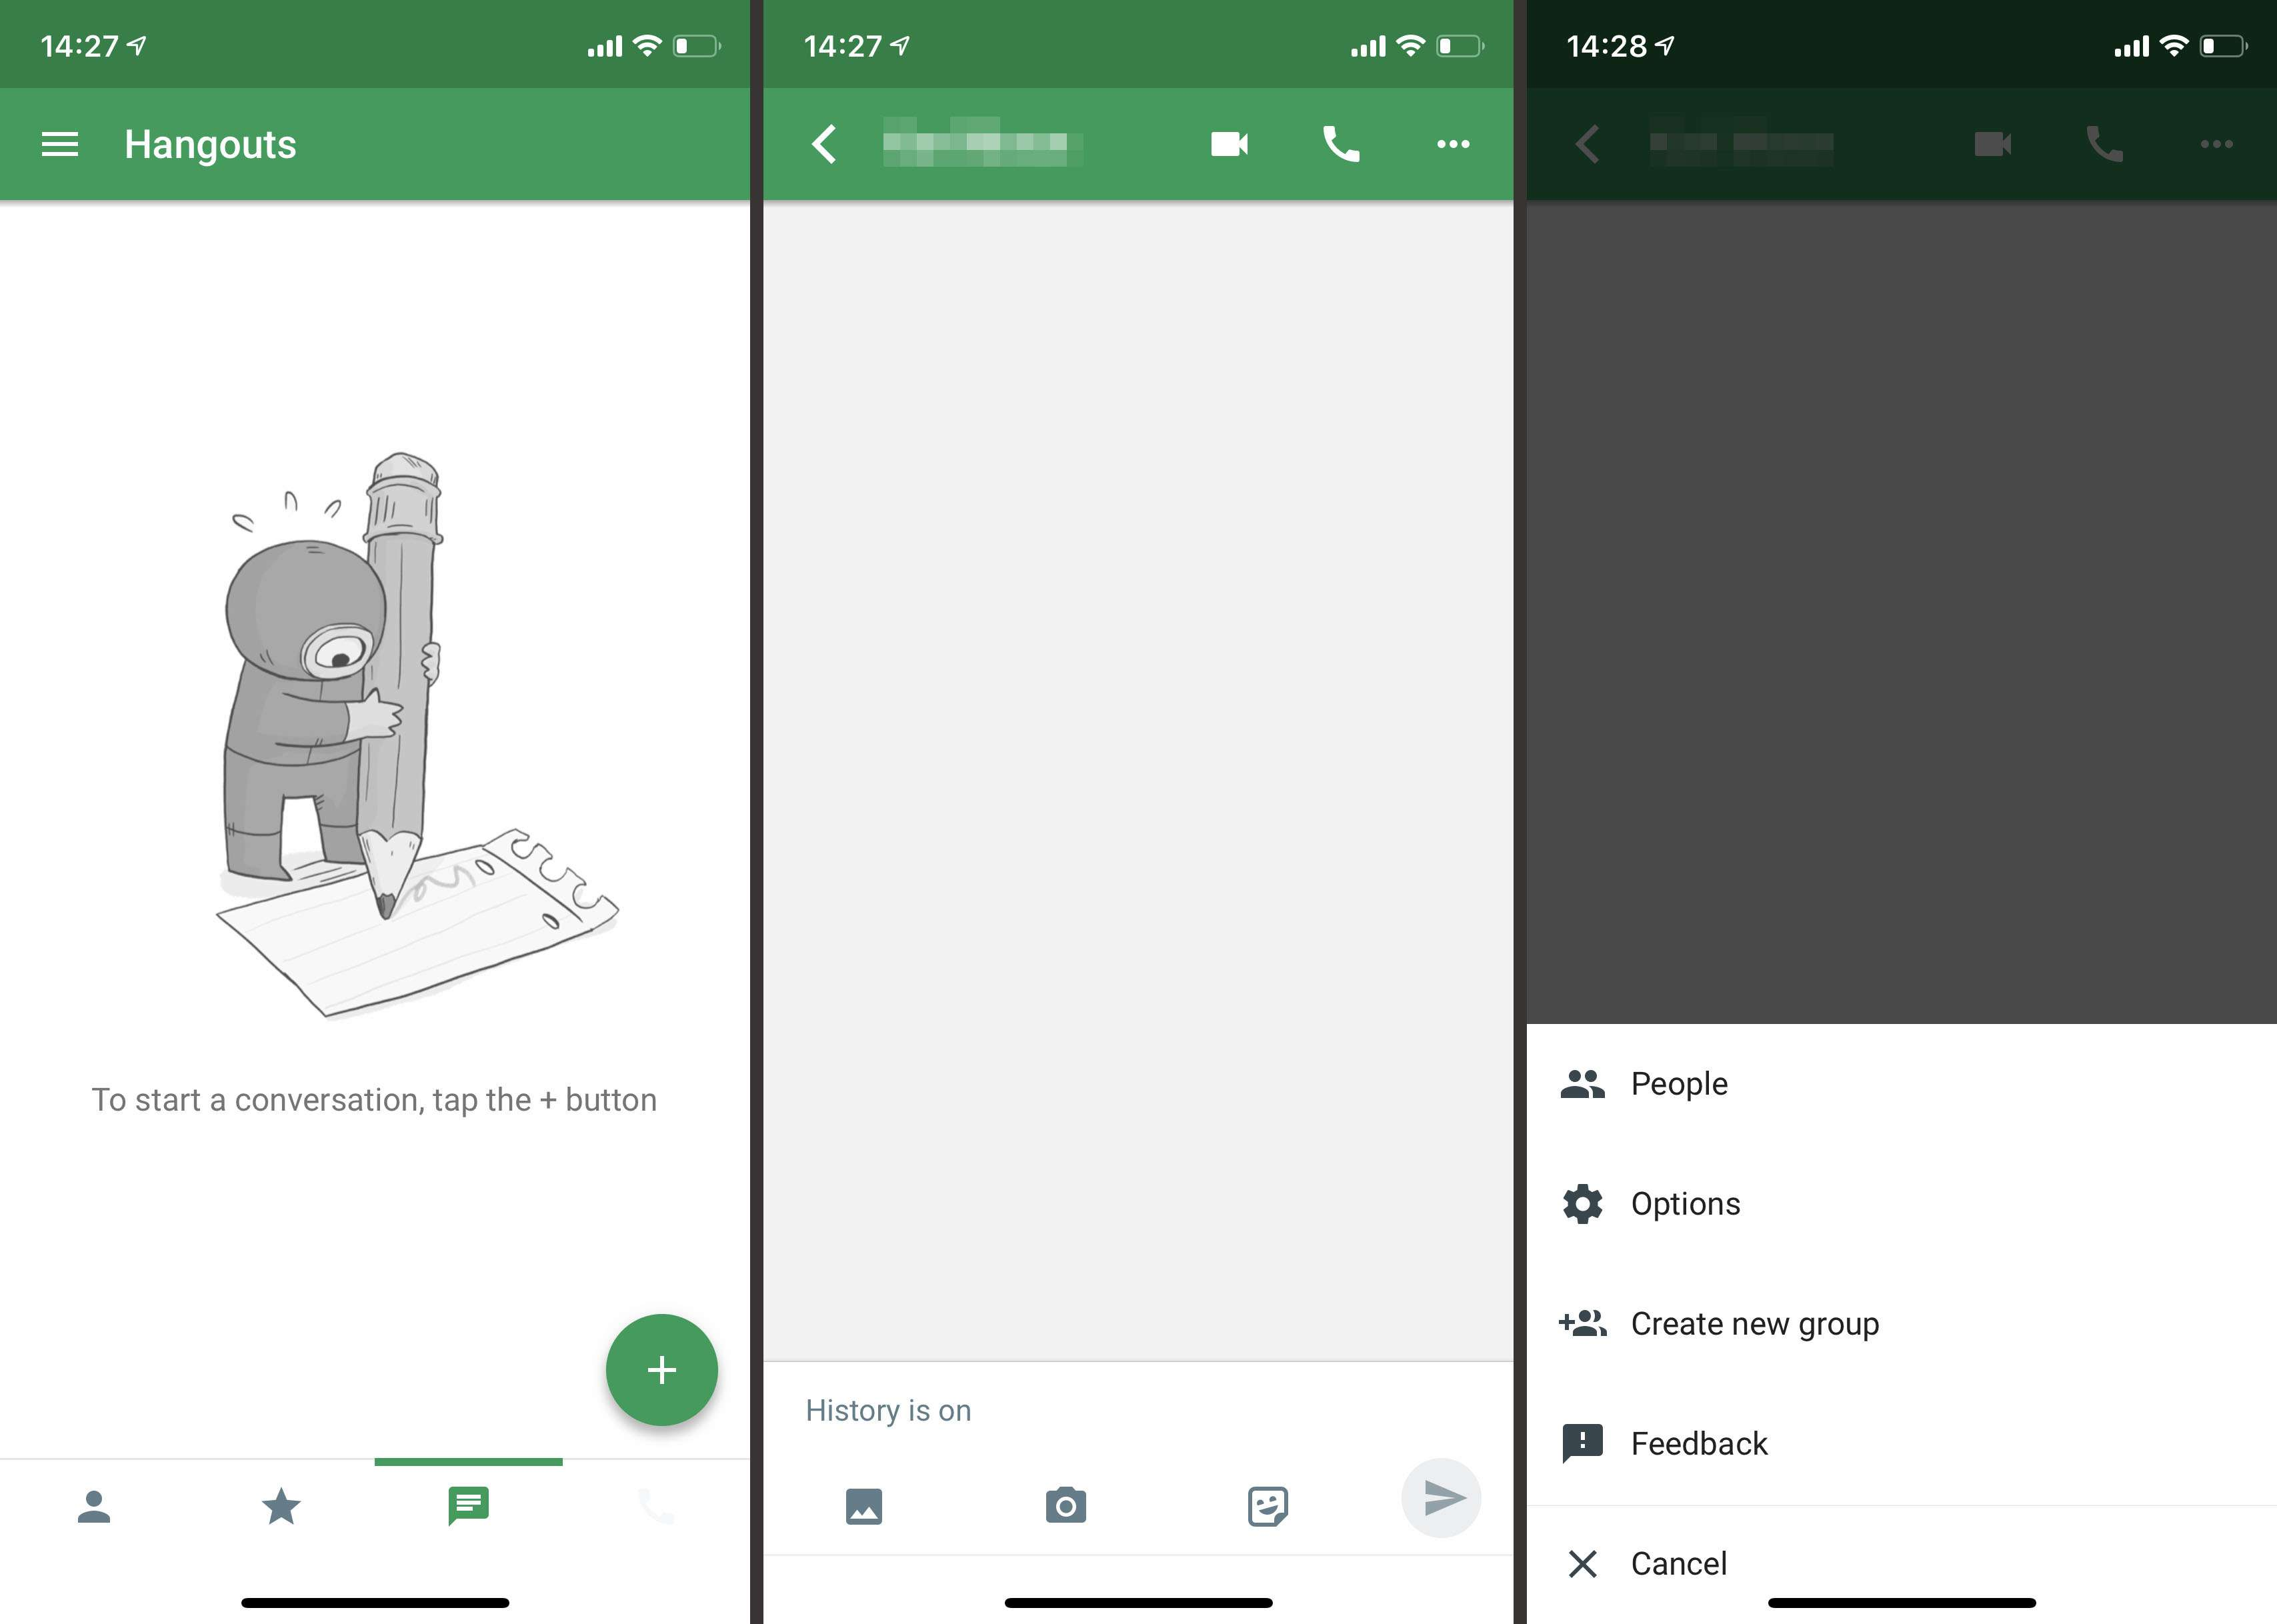 Google Hangouts app on iOS